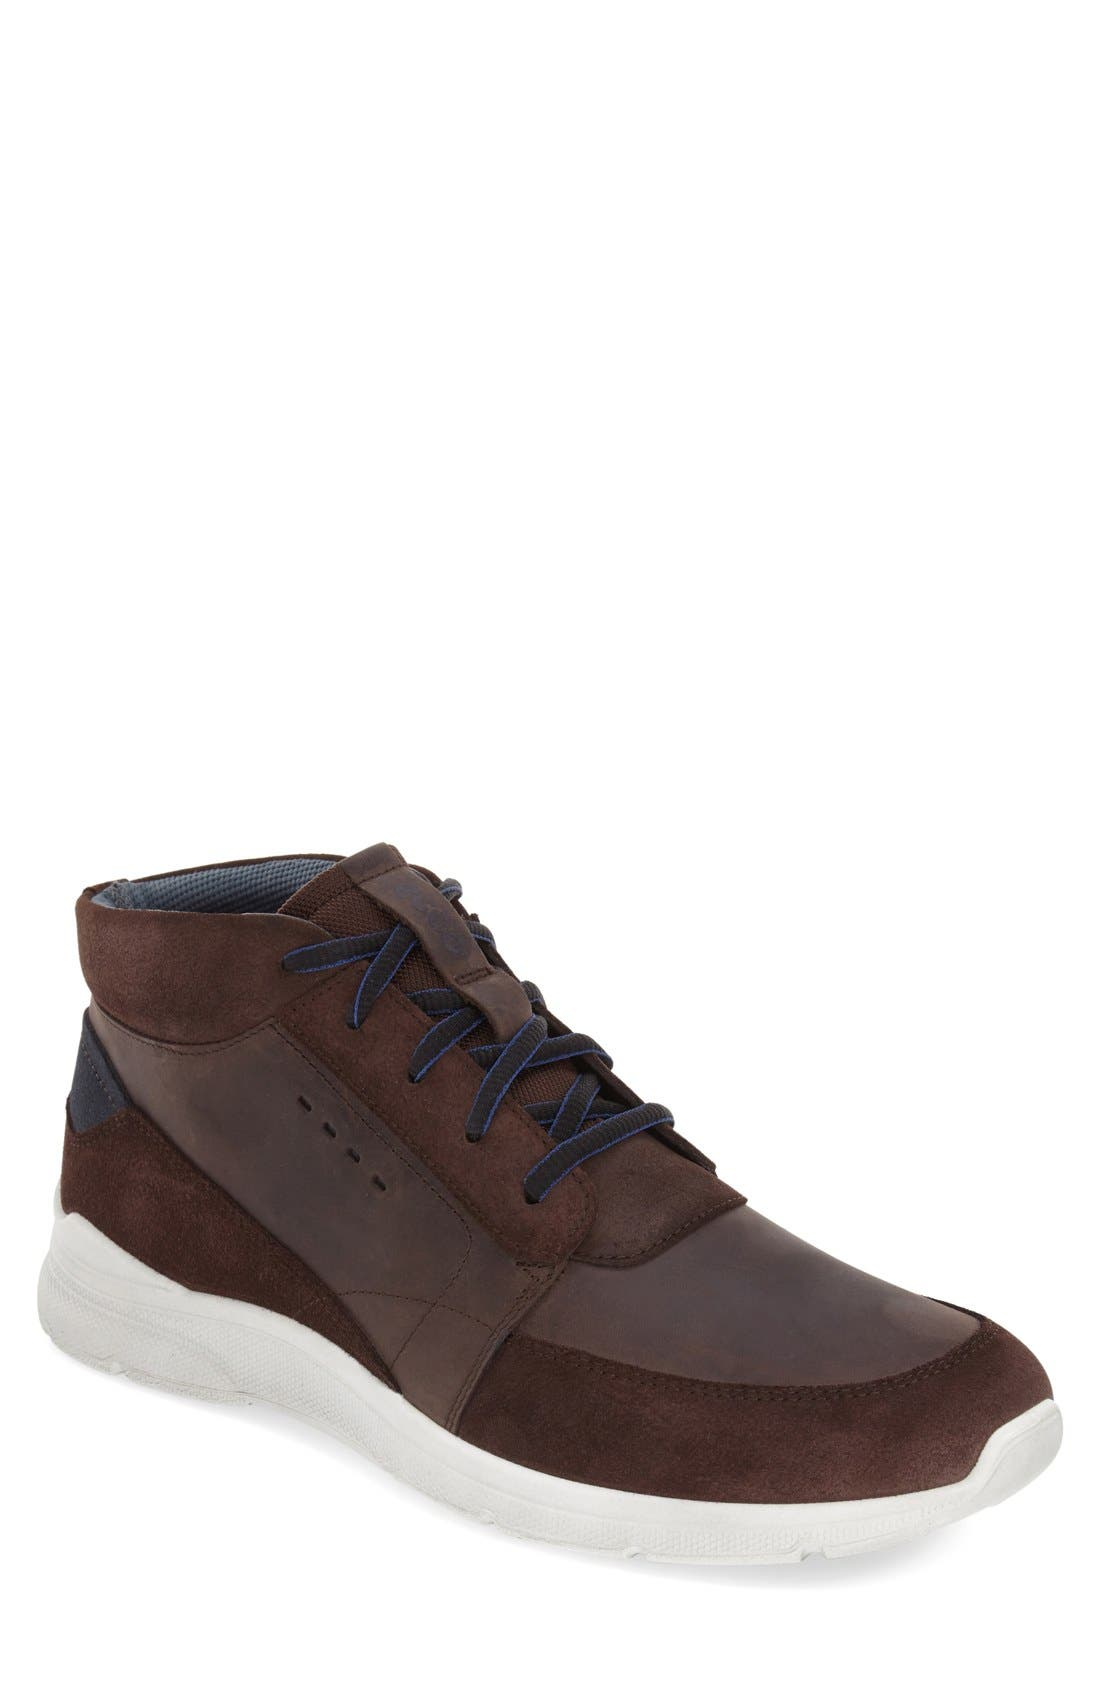 'Irondale Retro' High Top Sneaker,                             Main thumbnail 1, color,                             206